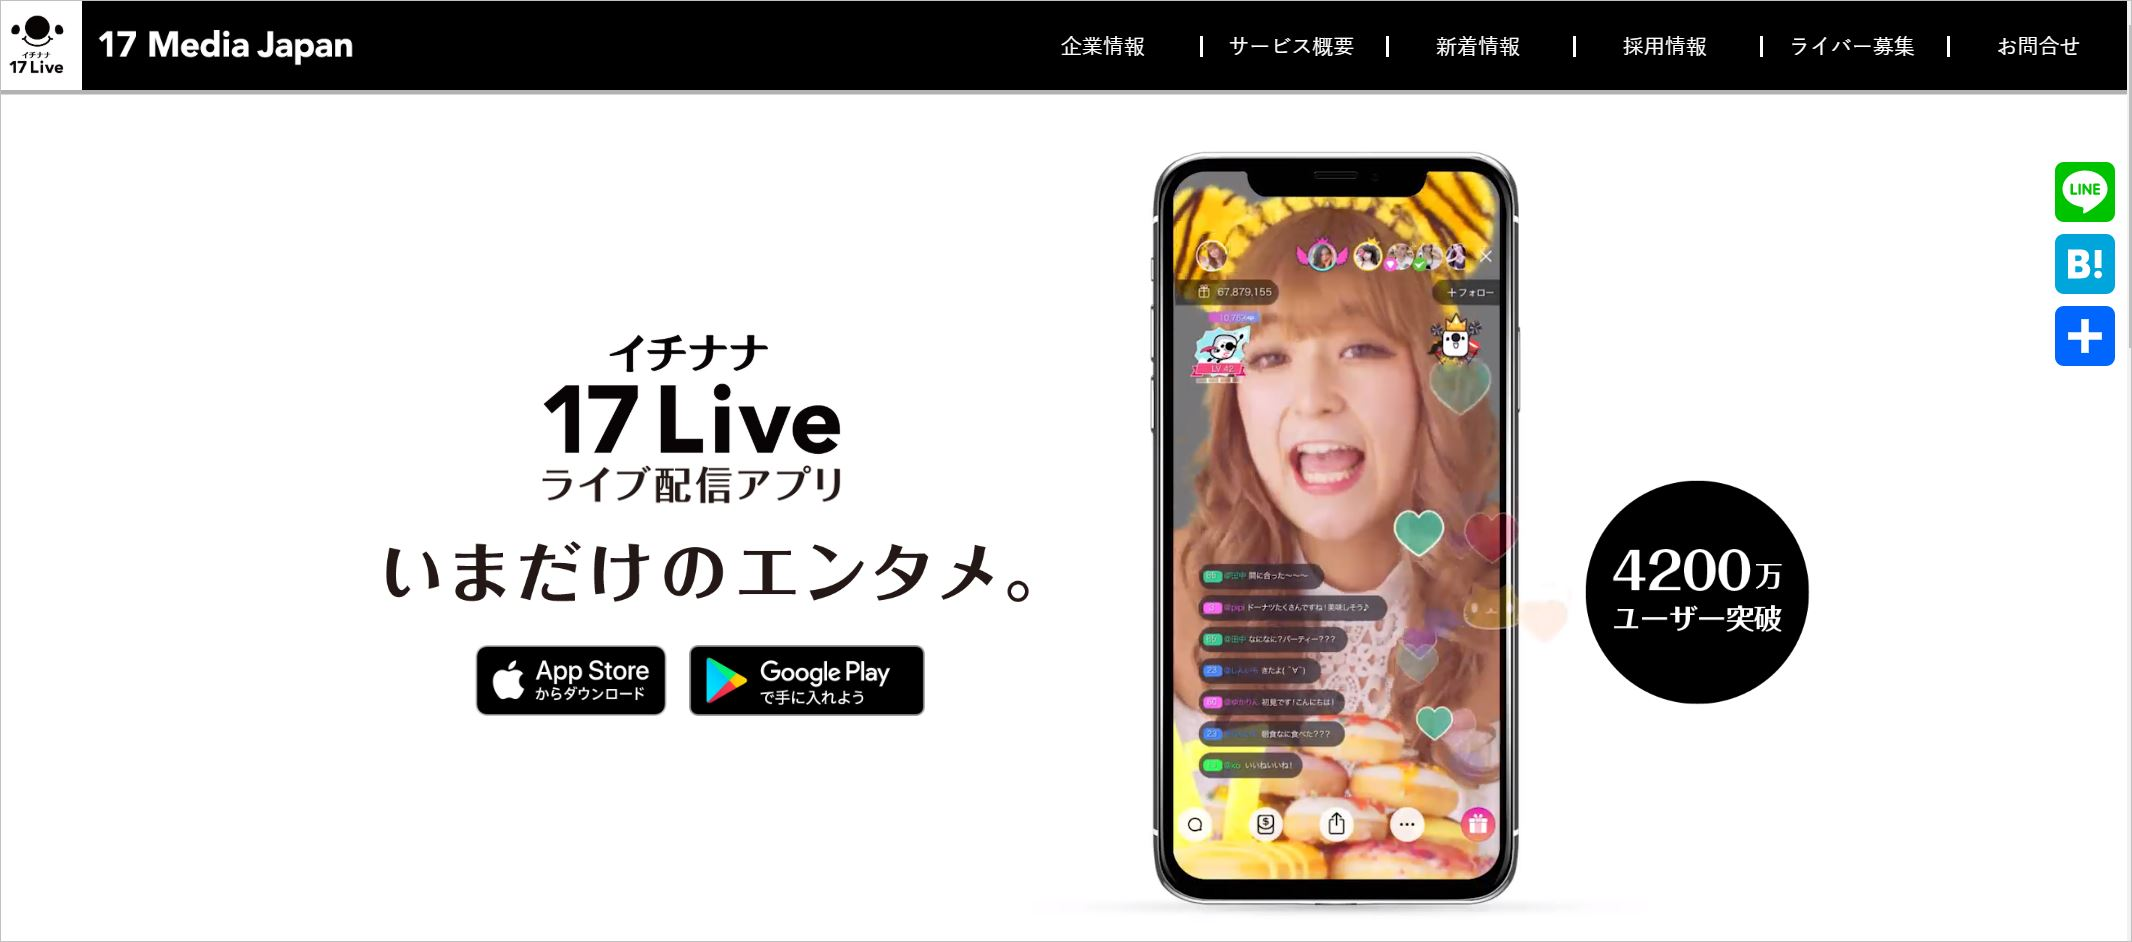 17Liveのトップ画面